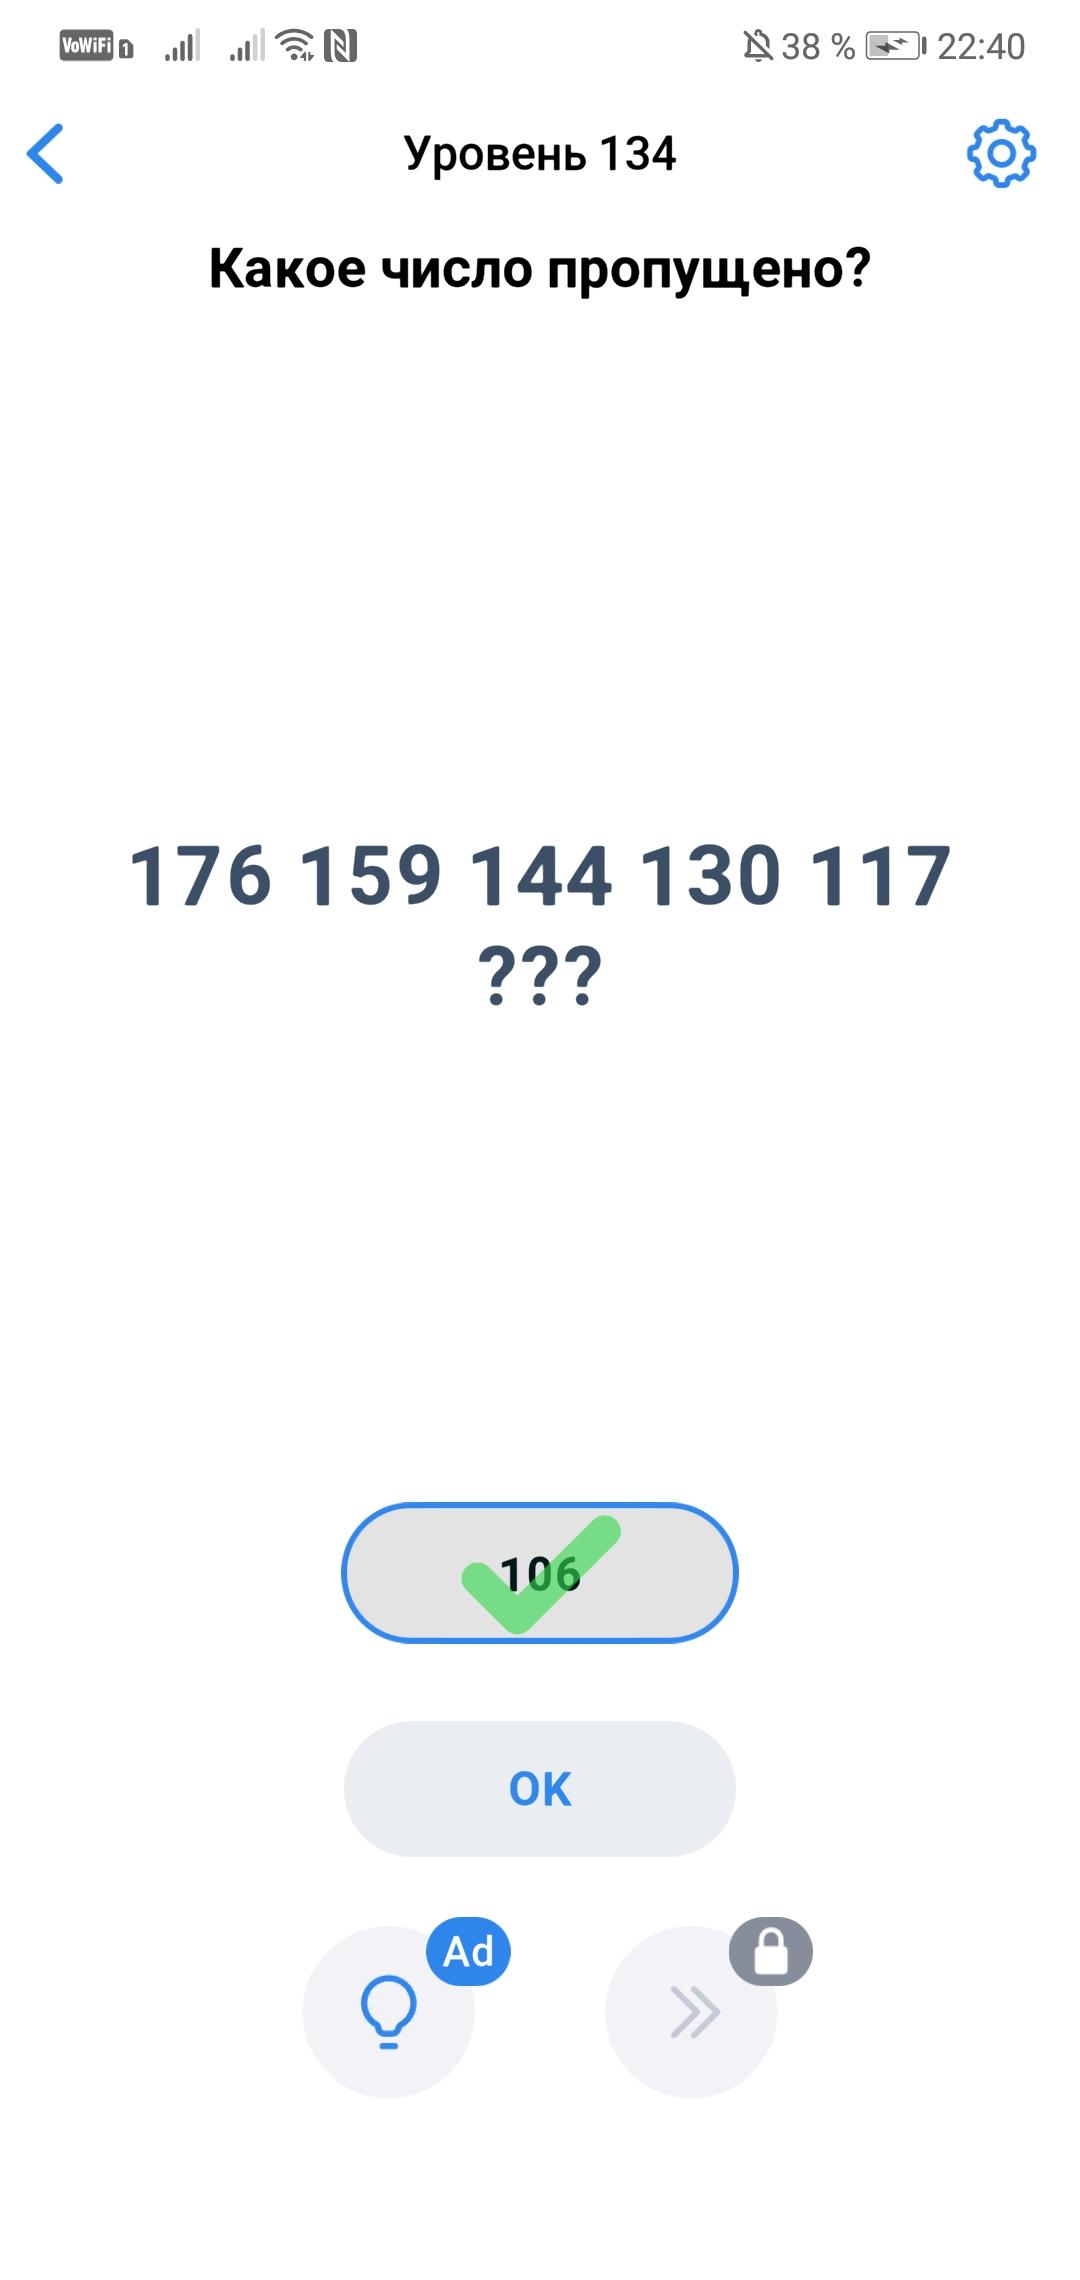 Easy Game - 134 уровень - Какое число пропущено?